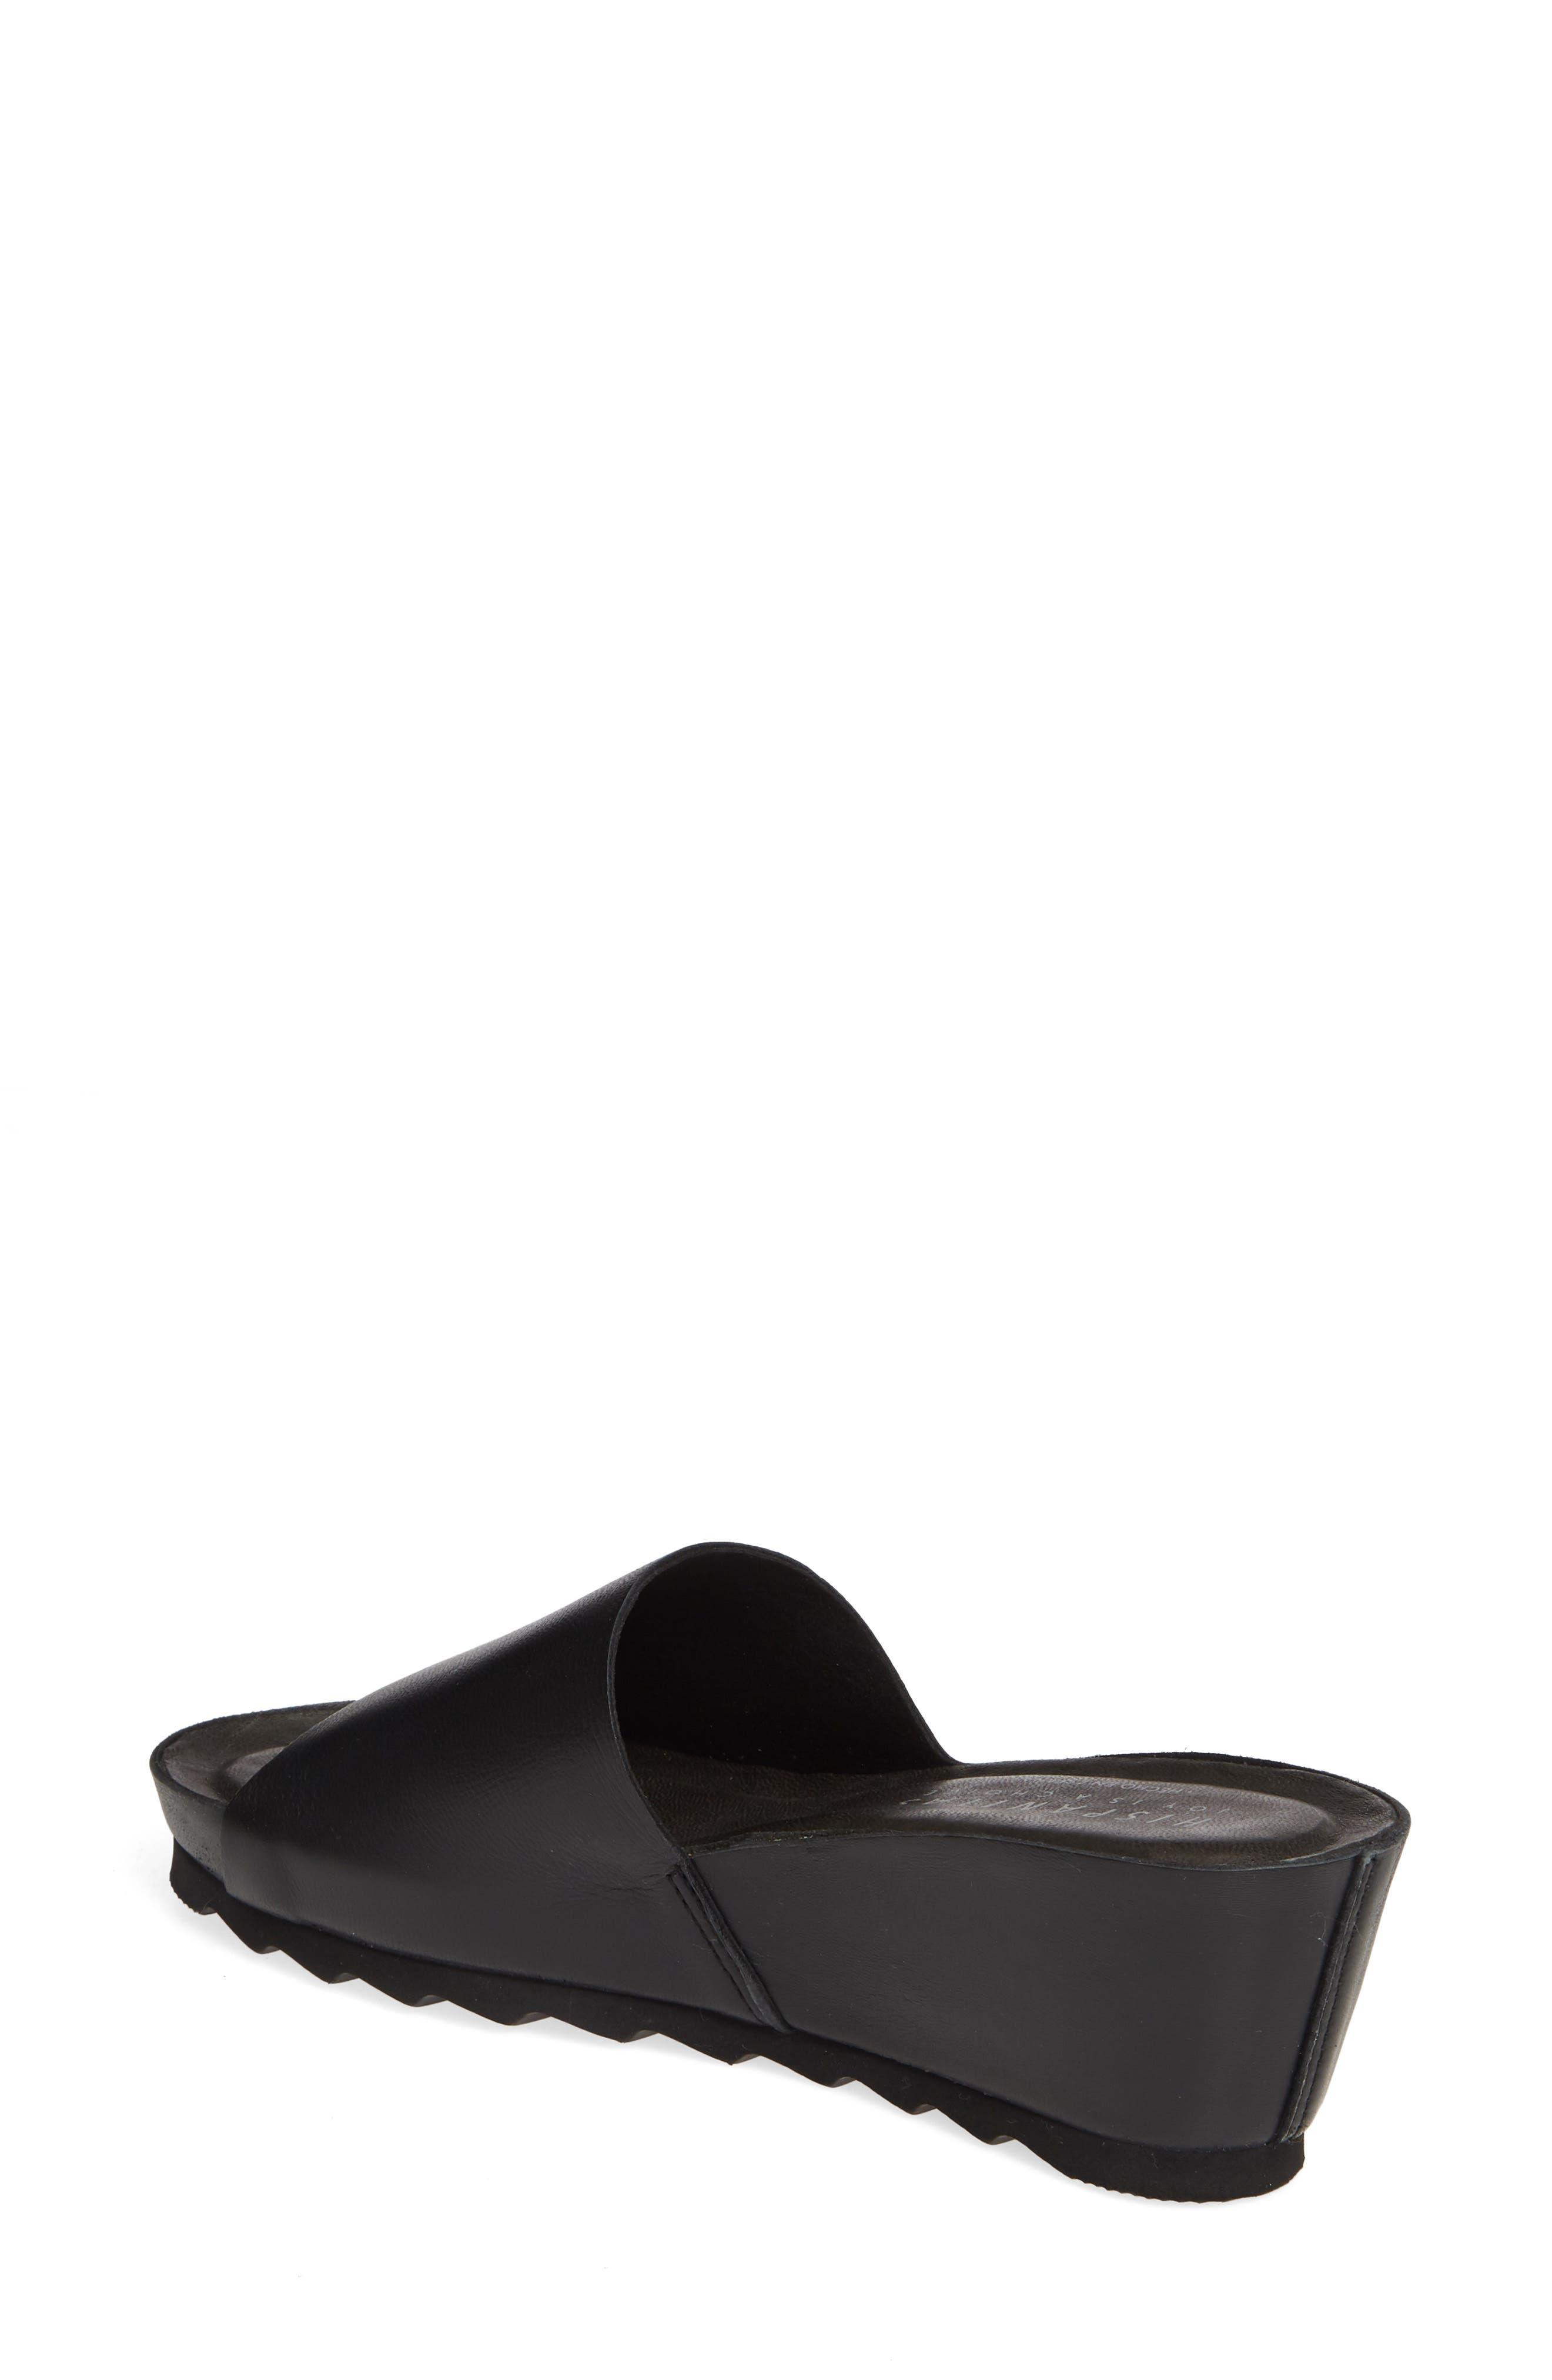 HISPANITAS, Vega Slide Sandal, Alternate thumbnail 2, color, BLACK LEATHER